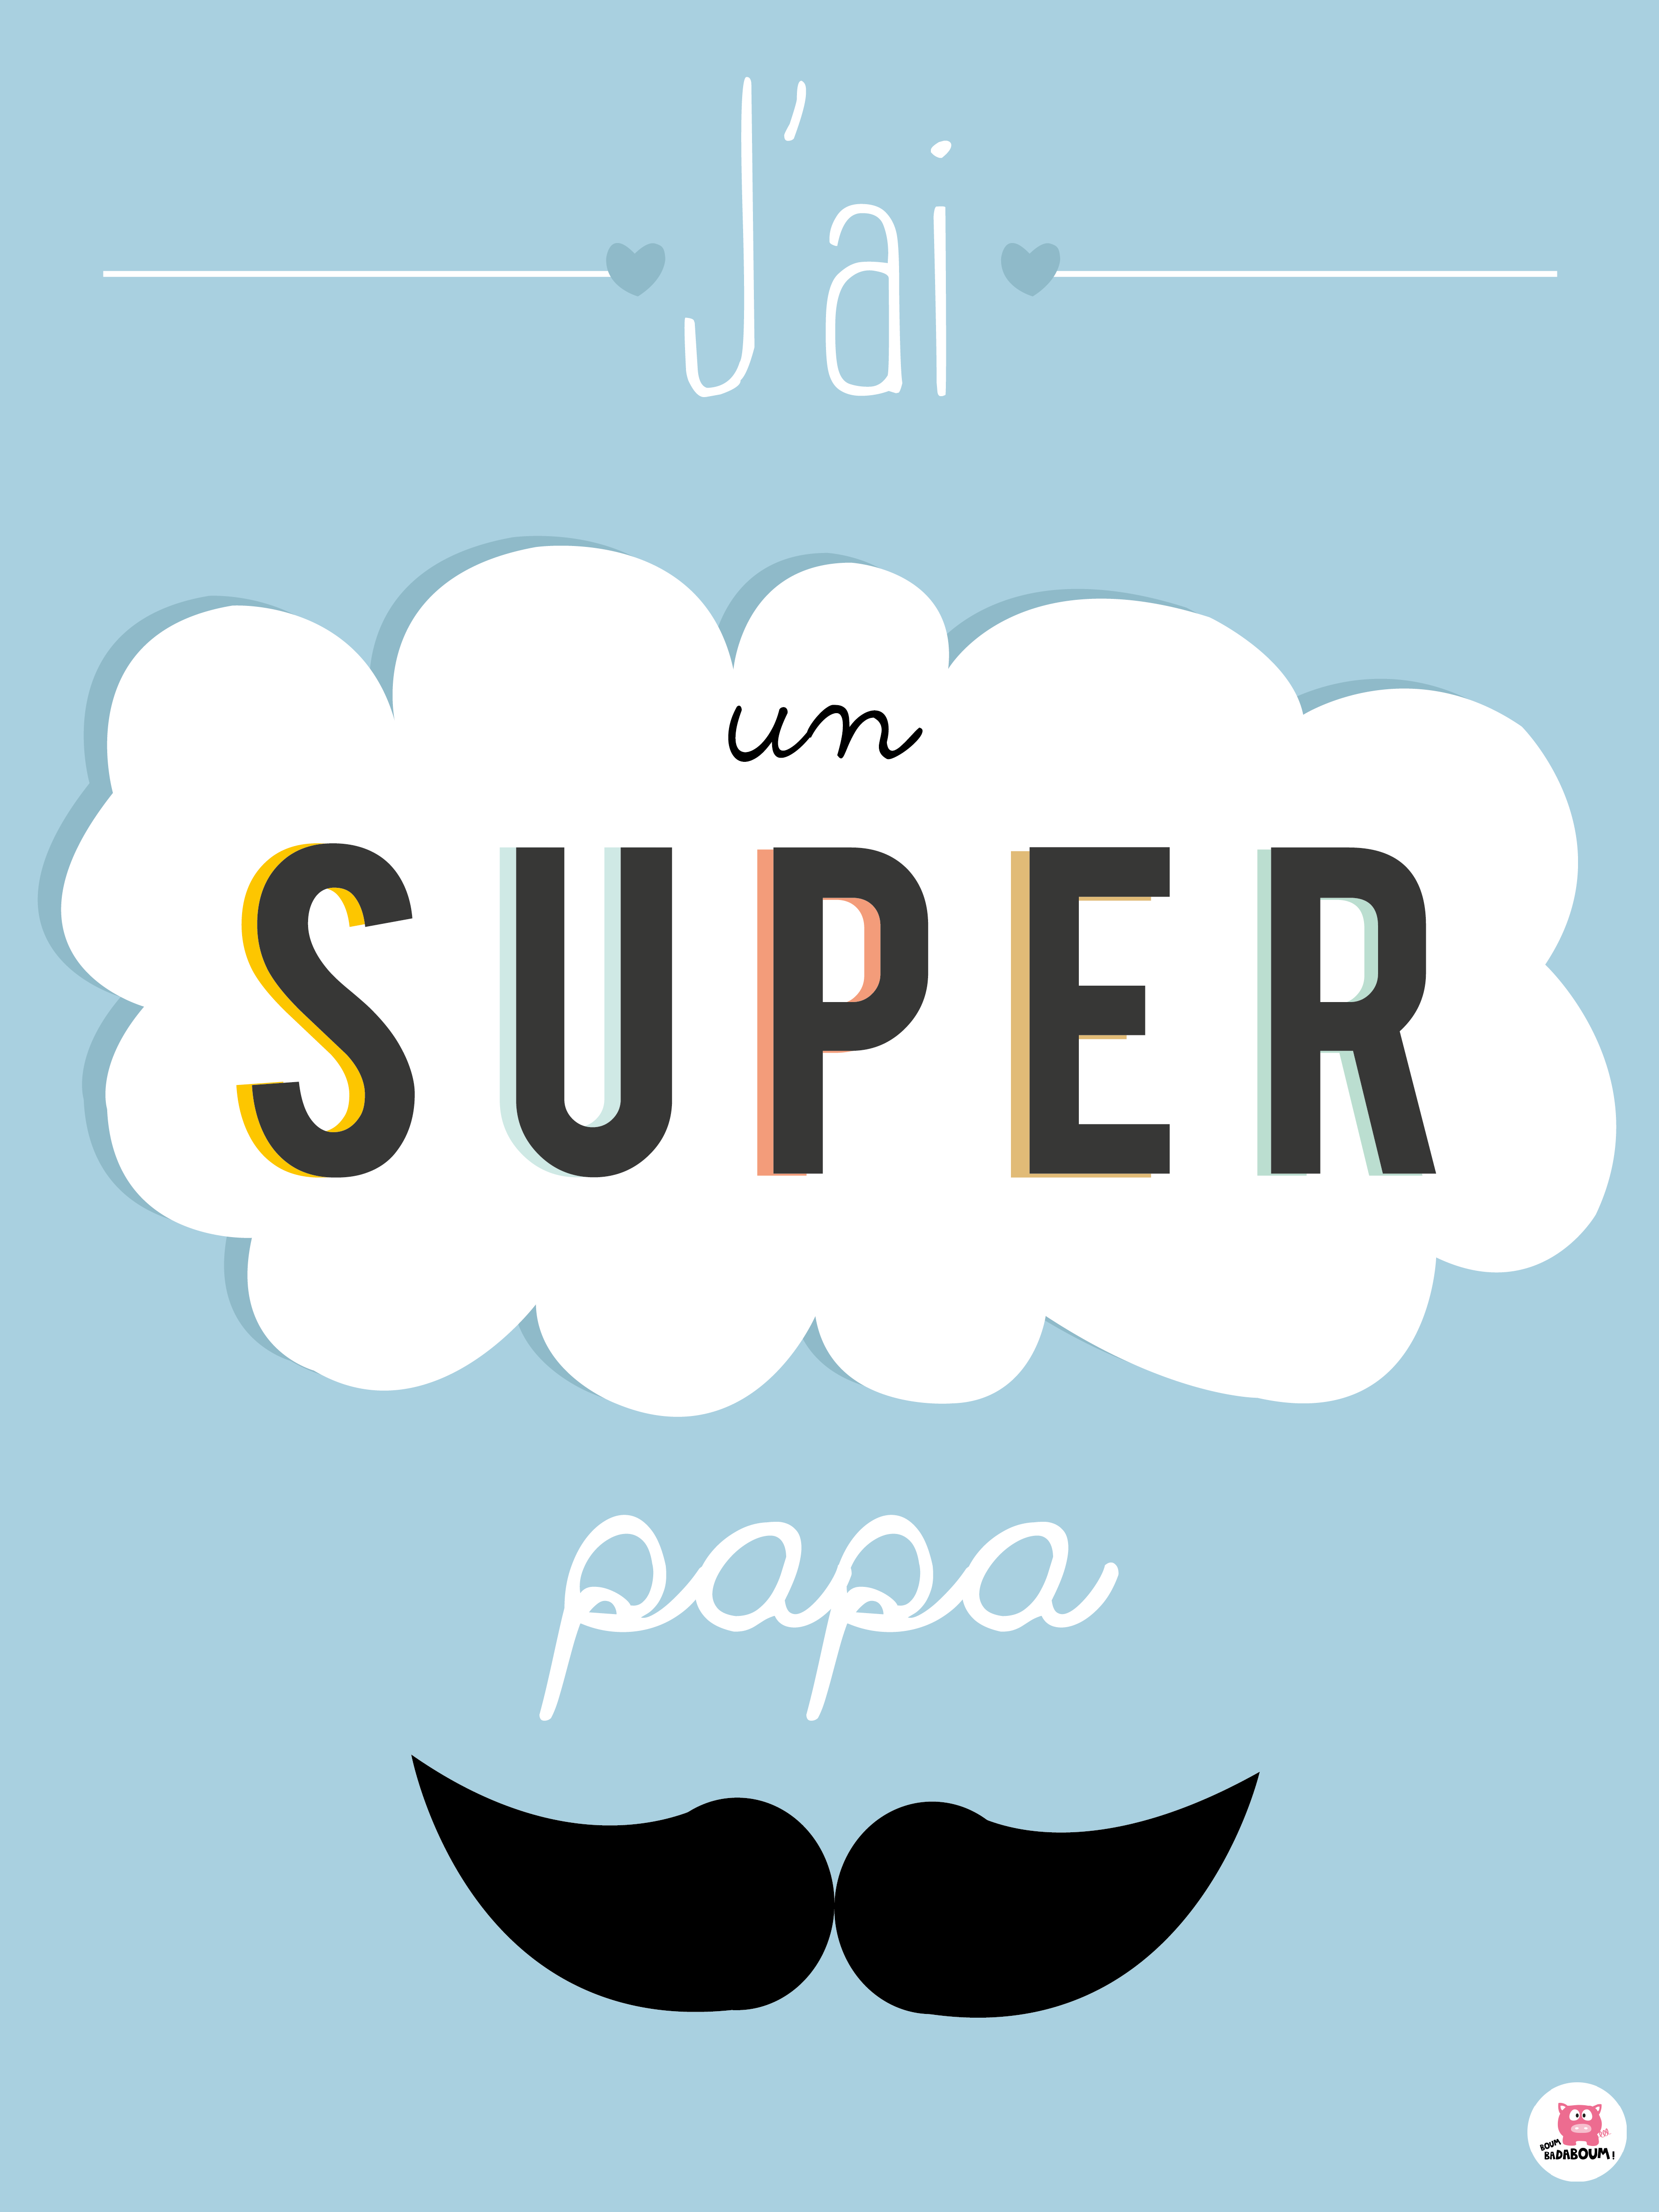 affiche déco pour un super papa i have a great dad sign in french